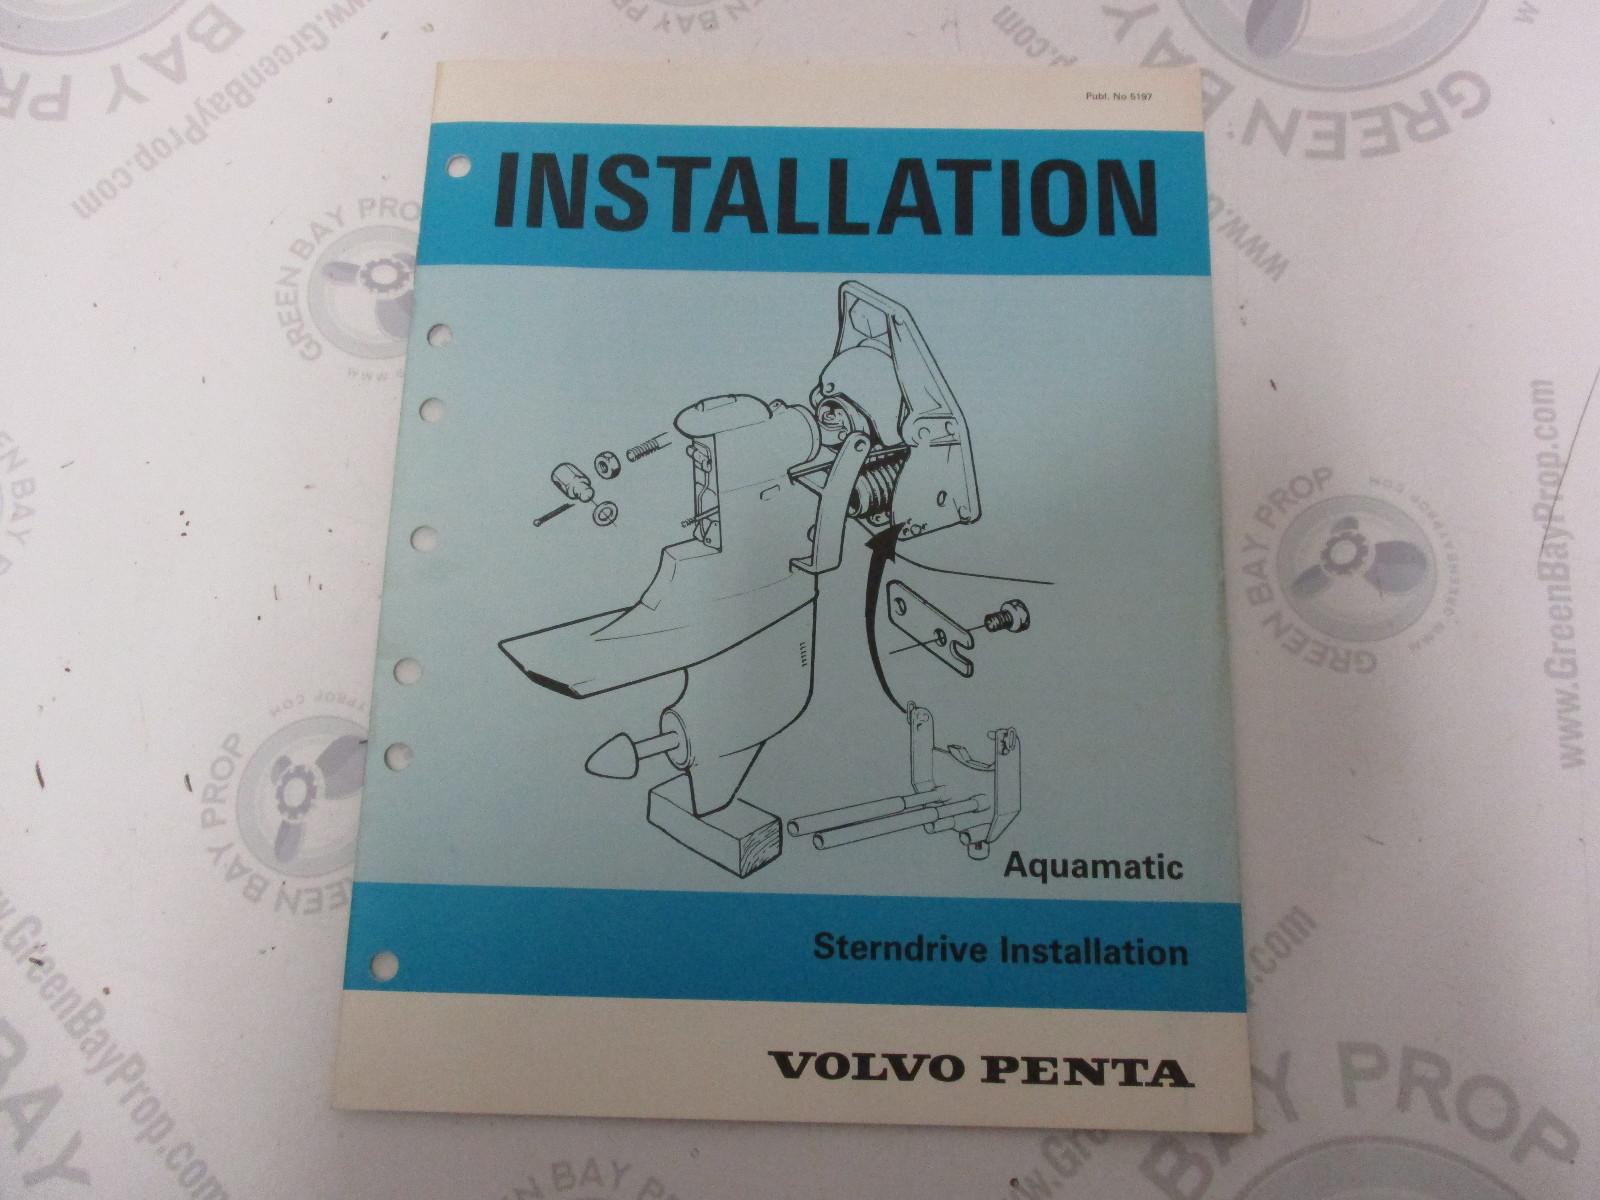 5197 Volvo Penta Installation Manual Aquamatic Sterndrive